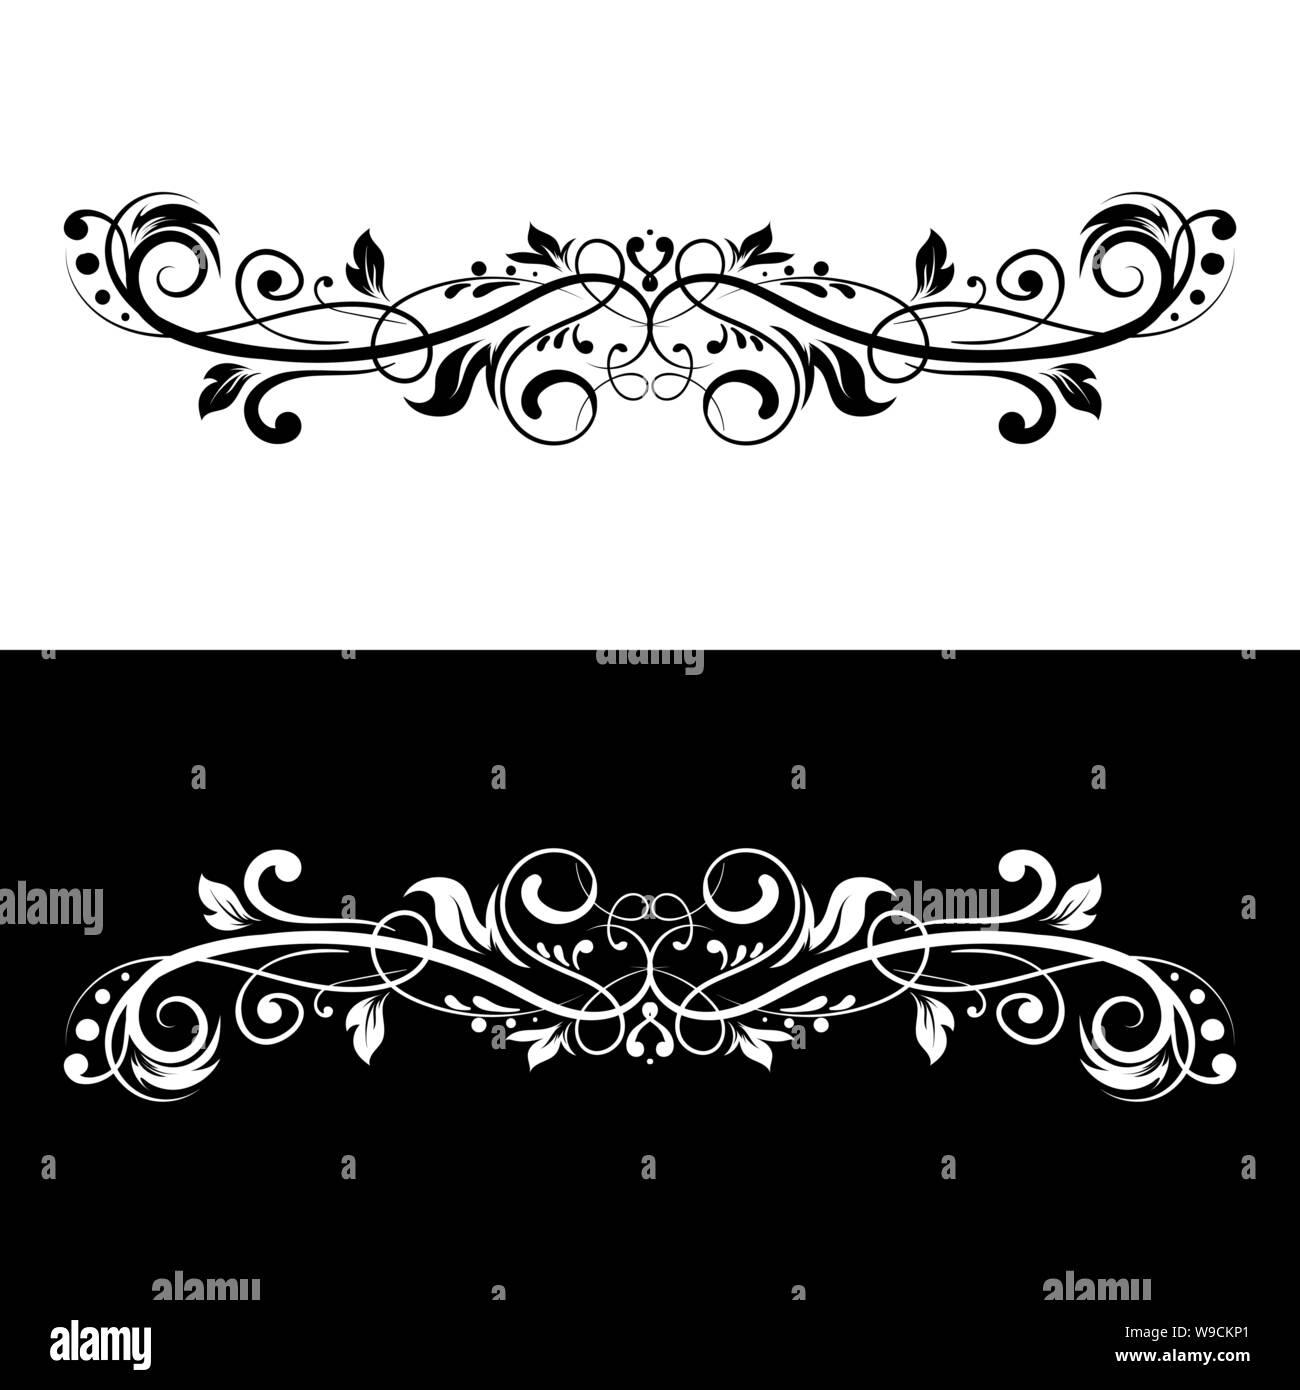 Ornamental dividers. Black and white decorative filigree design elements Stock Vector